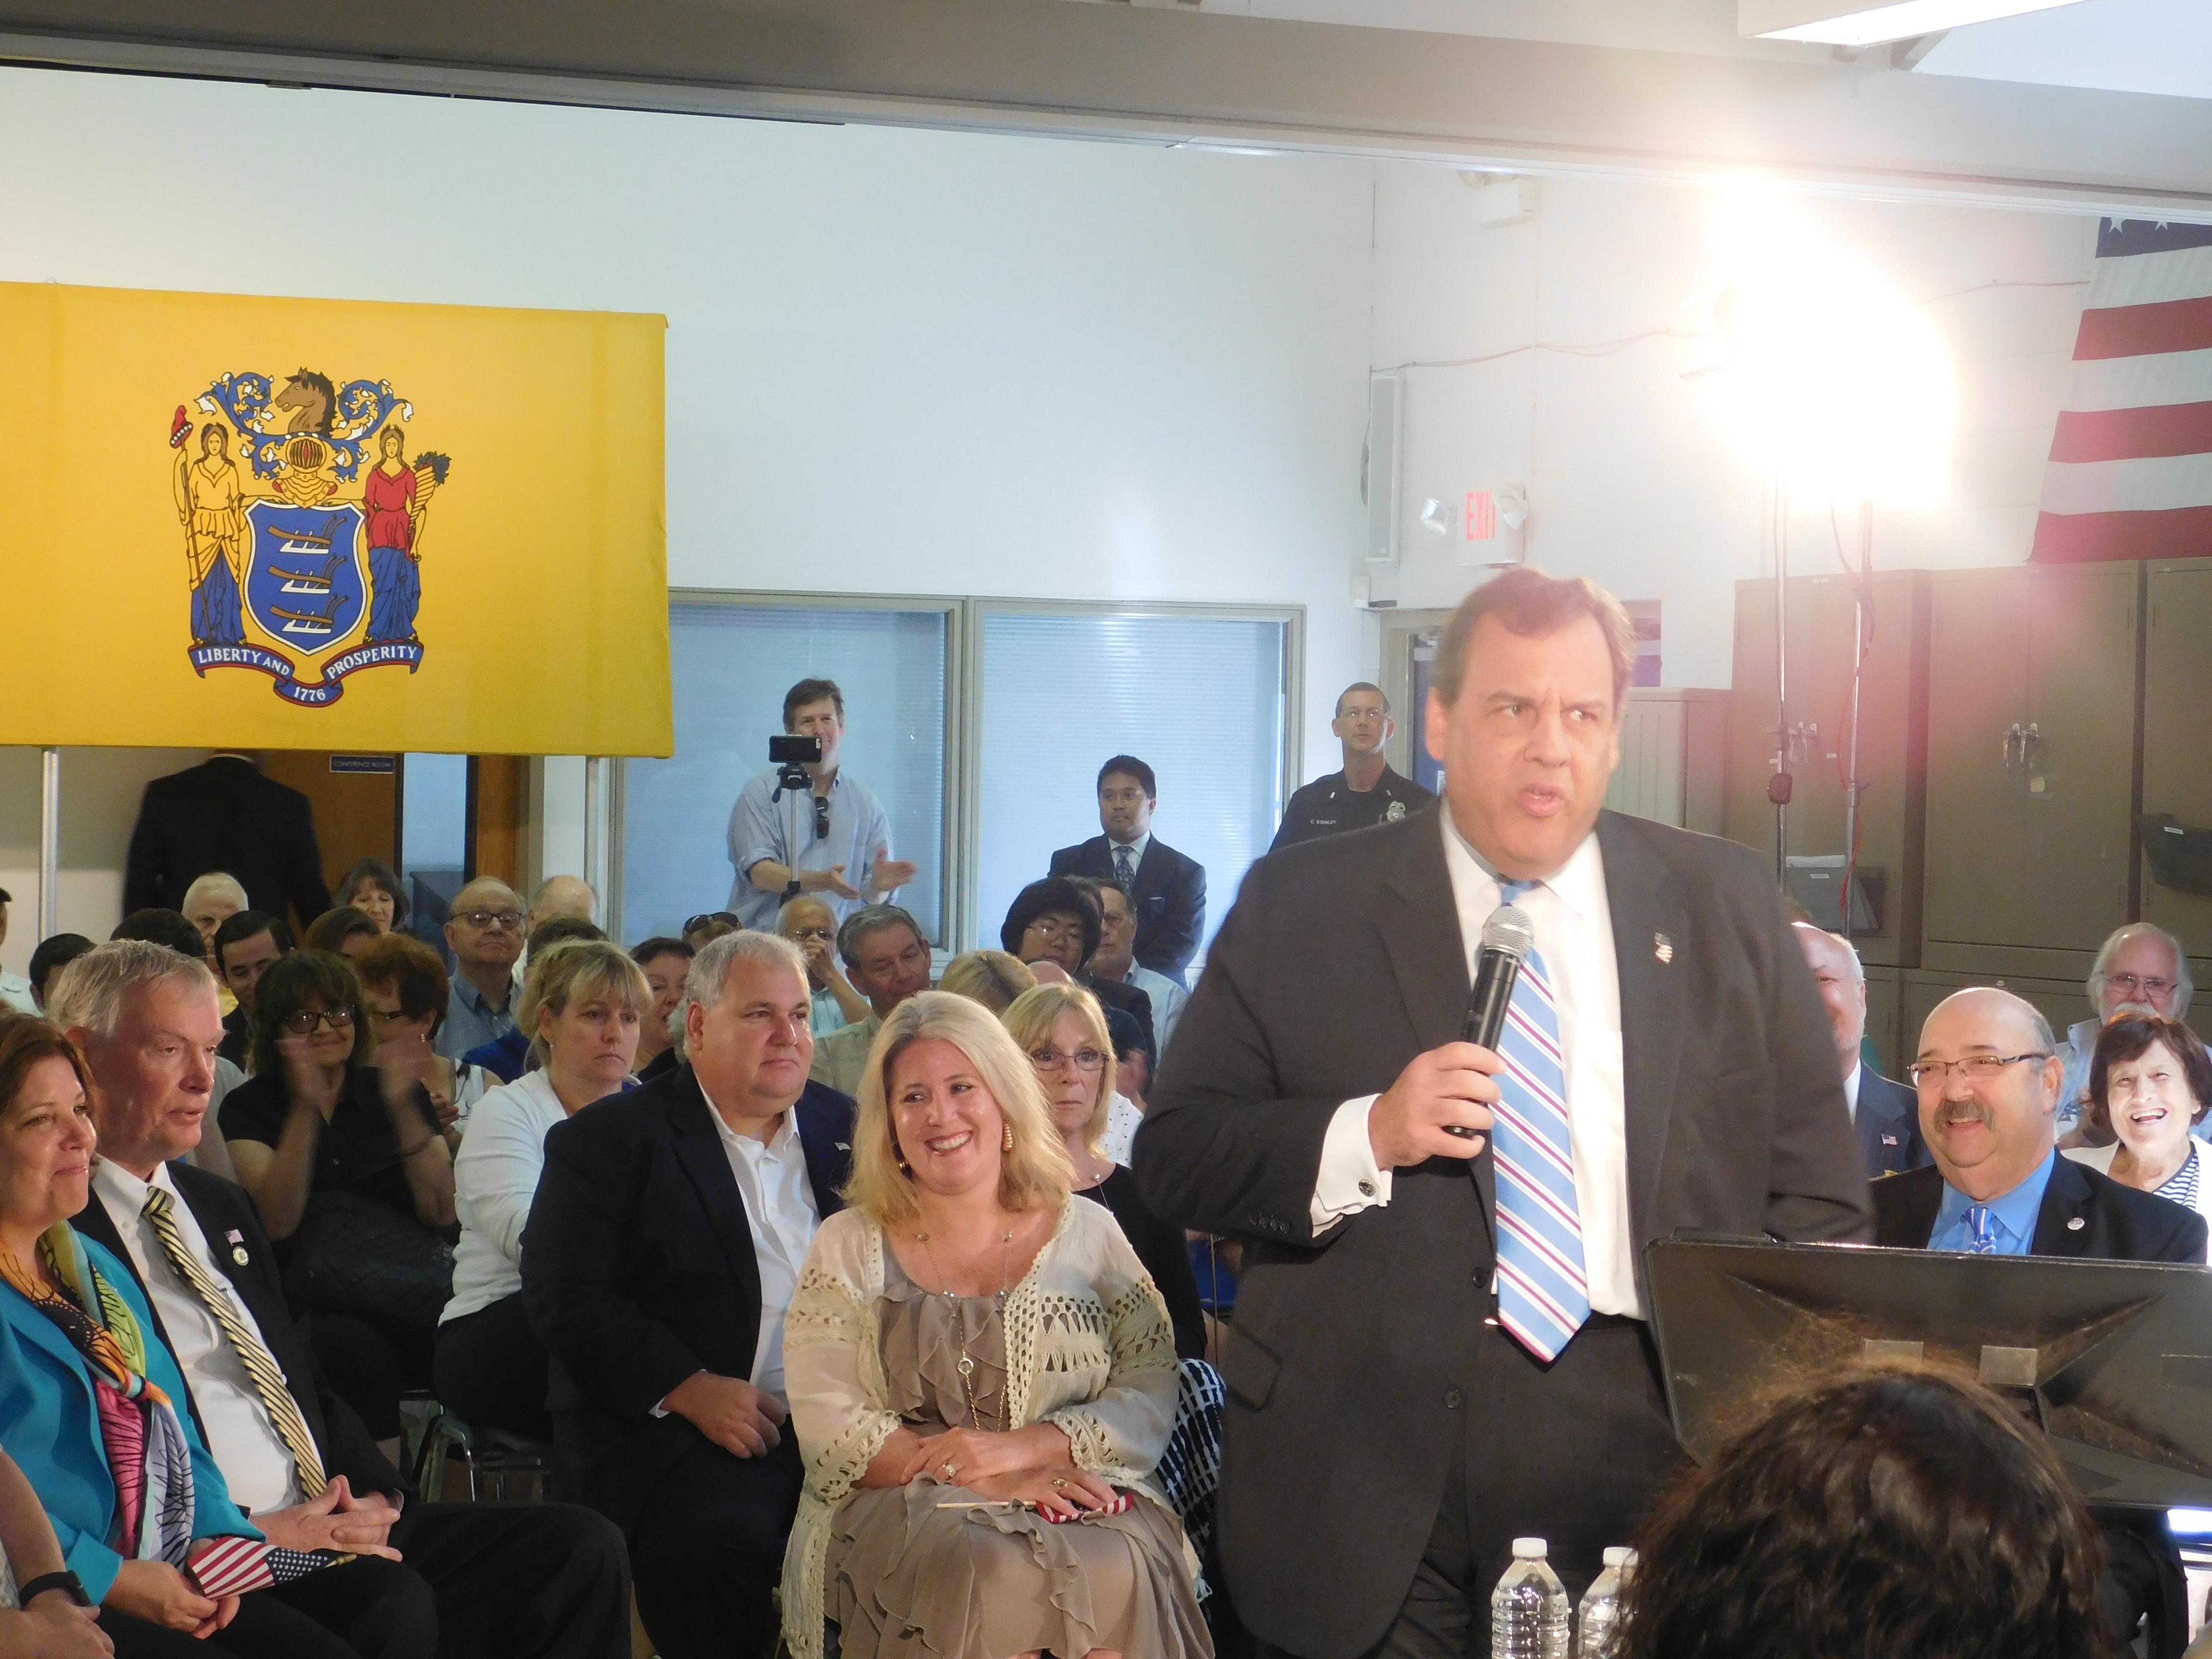 Governor Christie discusses school funding in Fair Lawn.